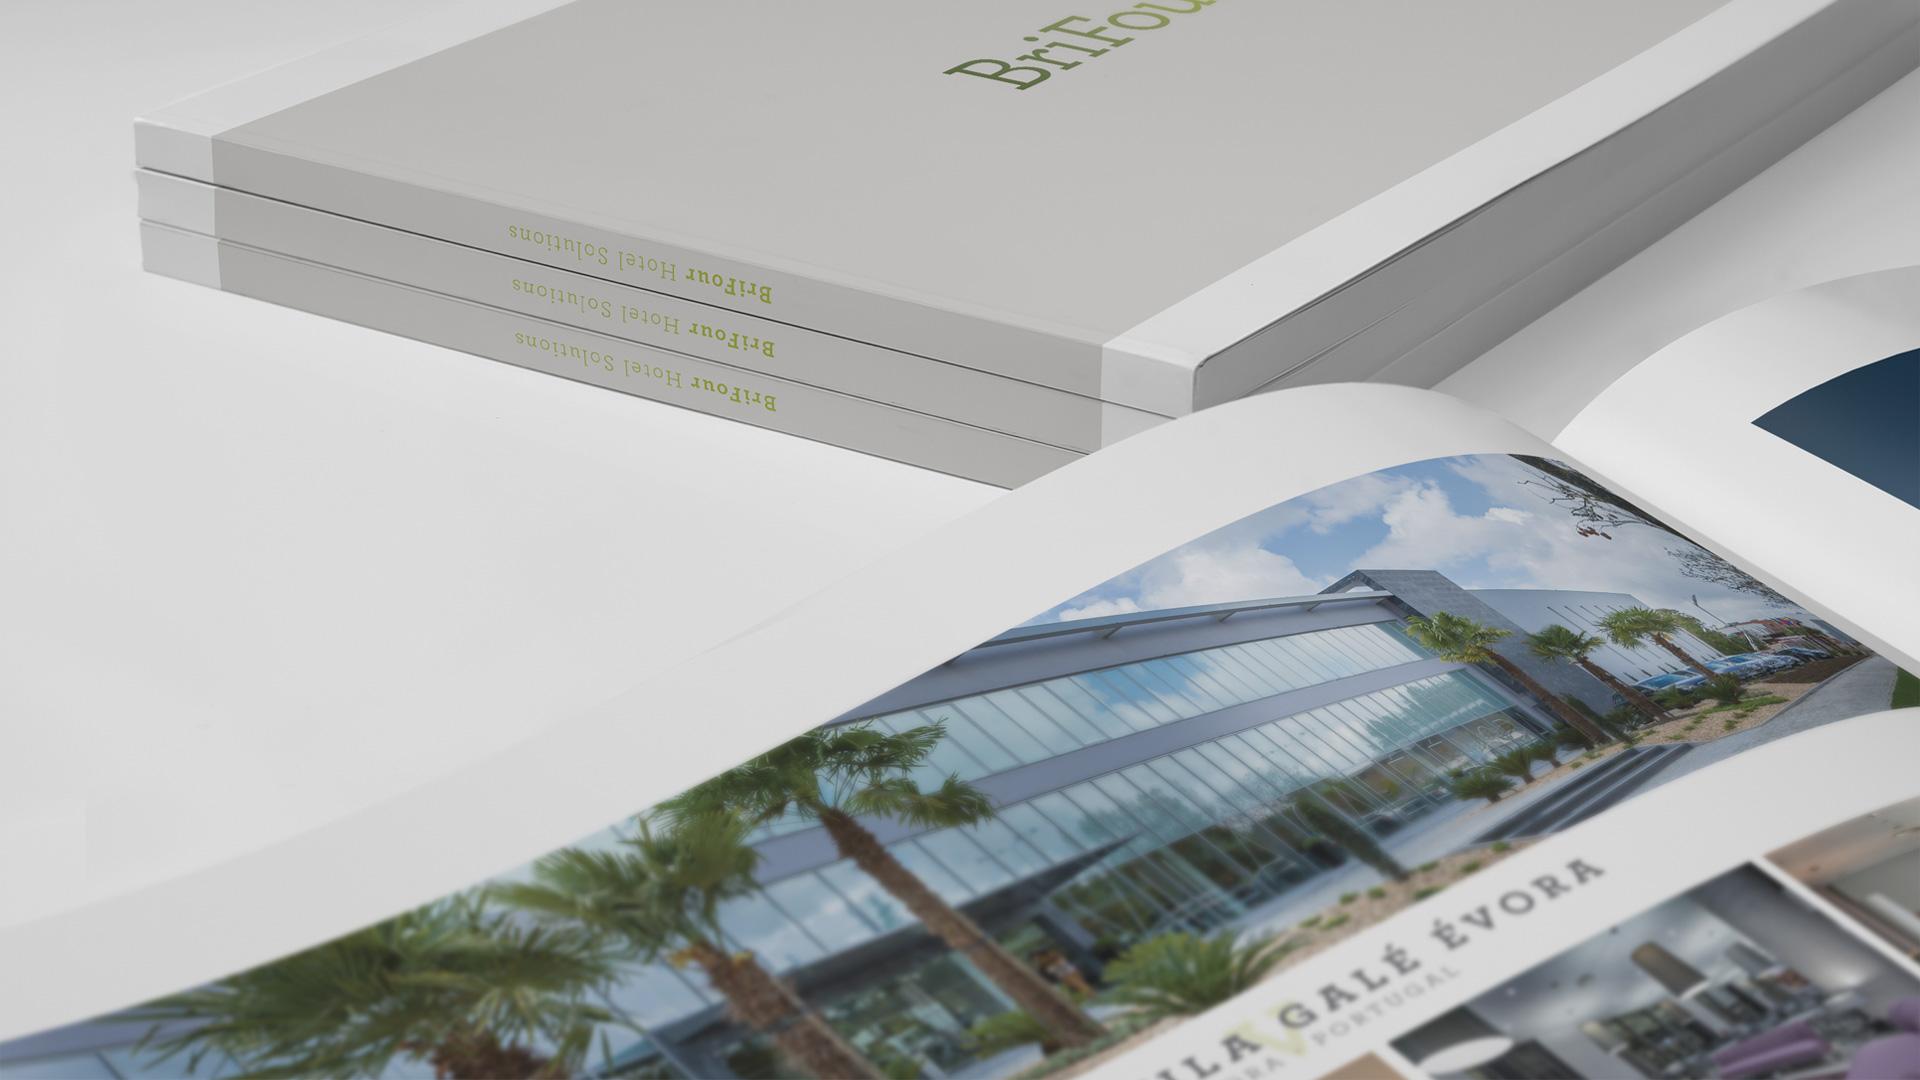 Brifour Hotel Solutions